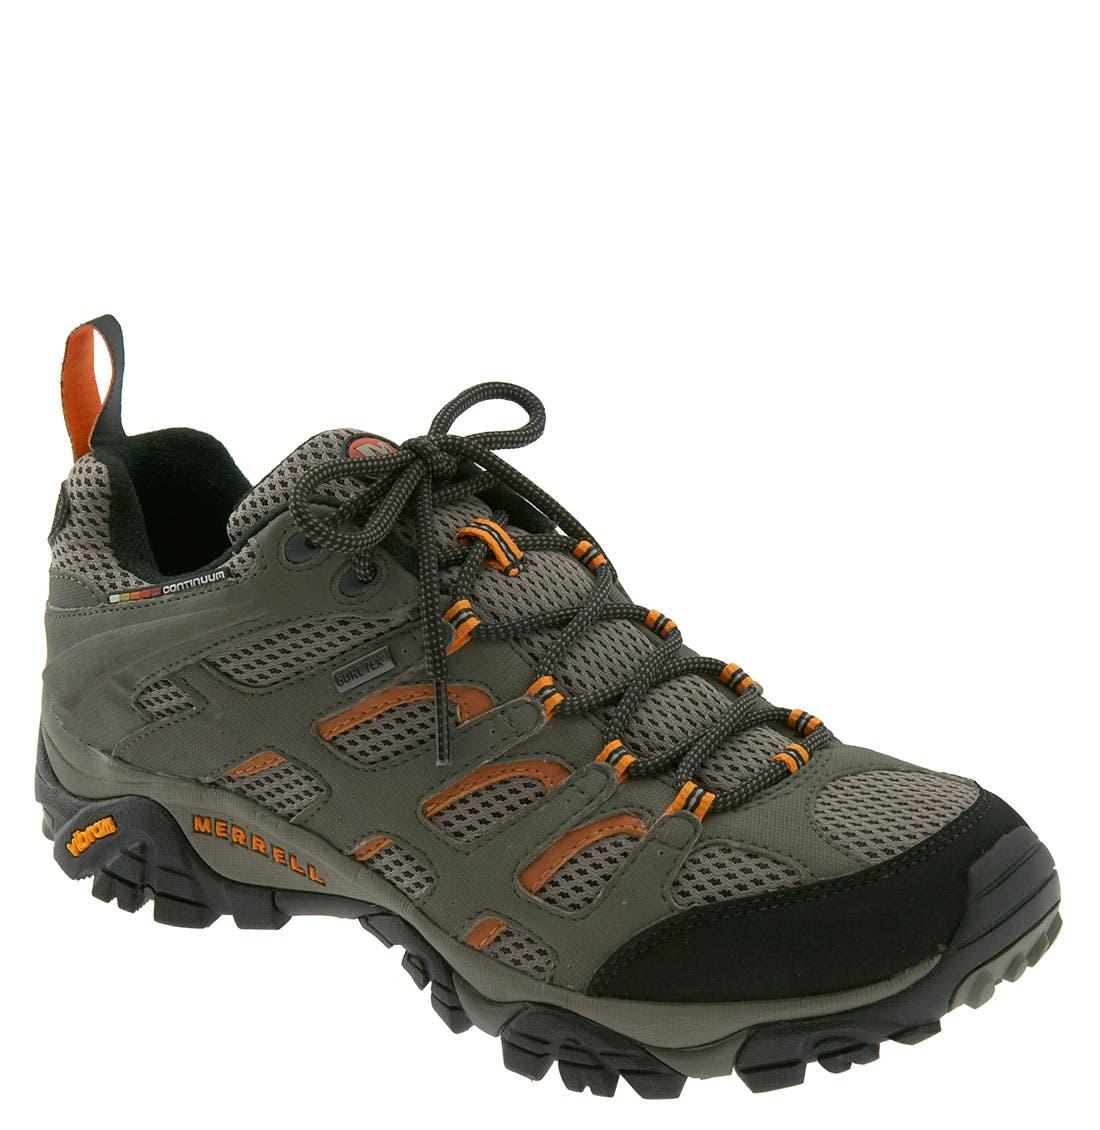 Main Image - Merrell 'Moab GTX XCR' Hiking Shoe (Men)